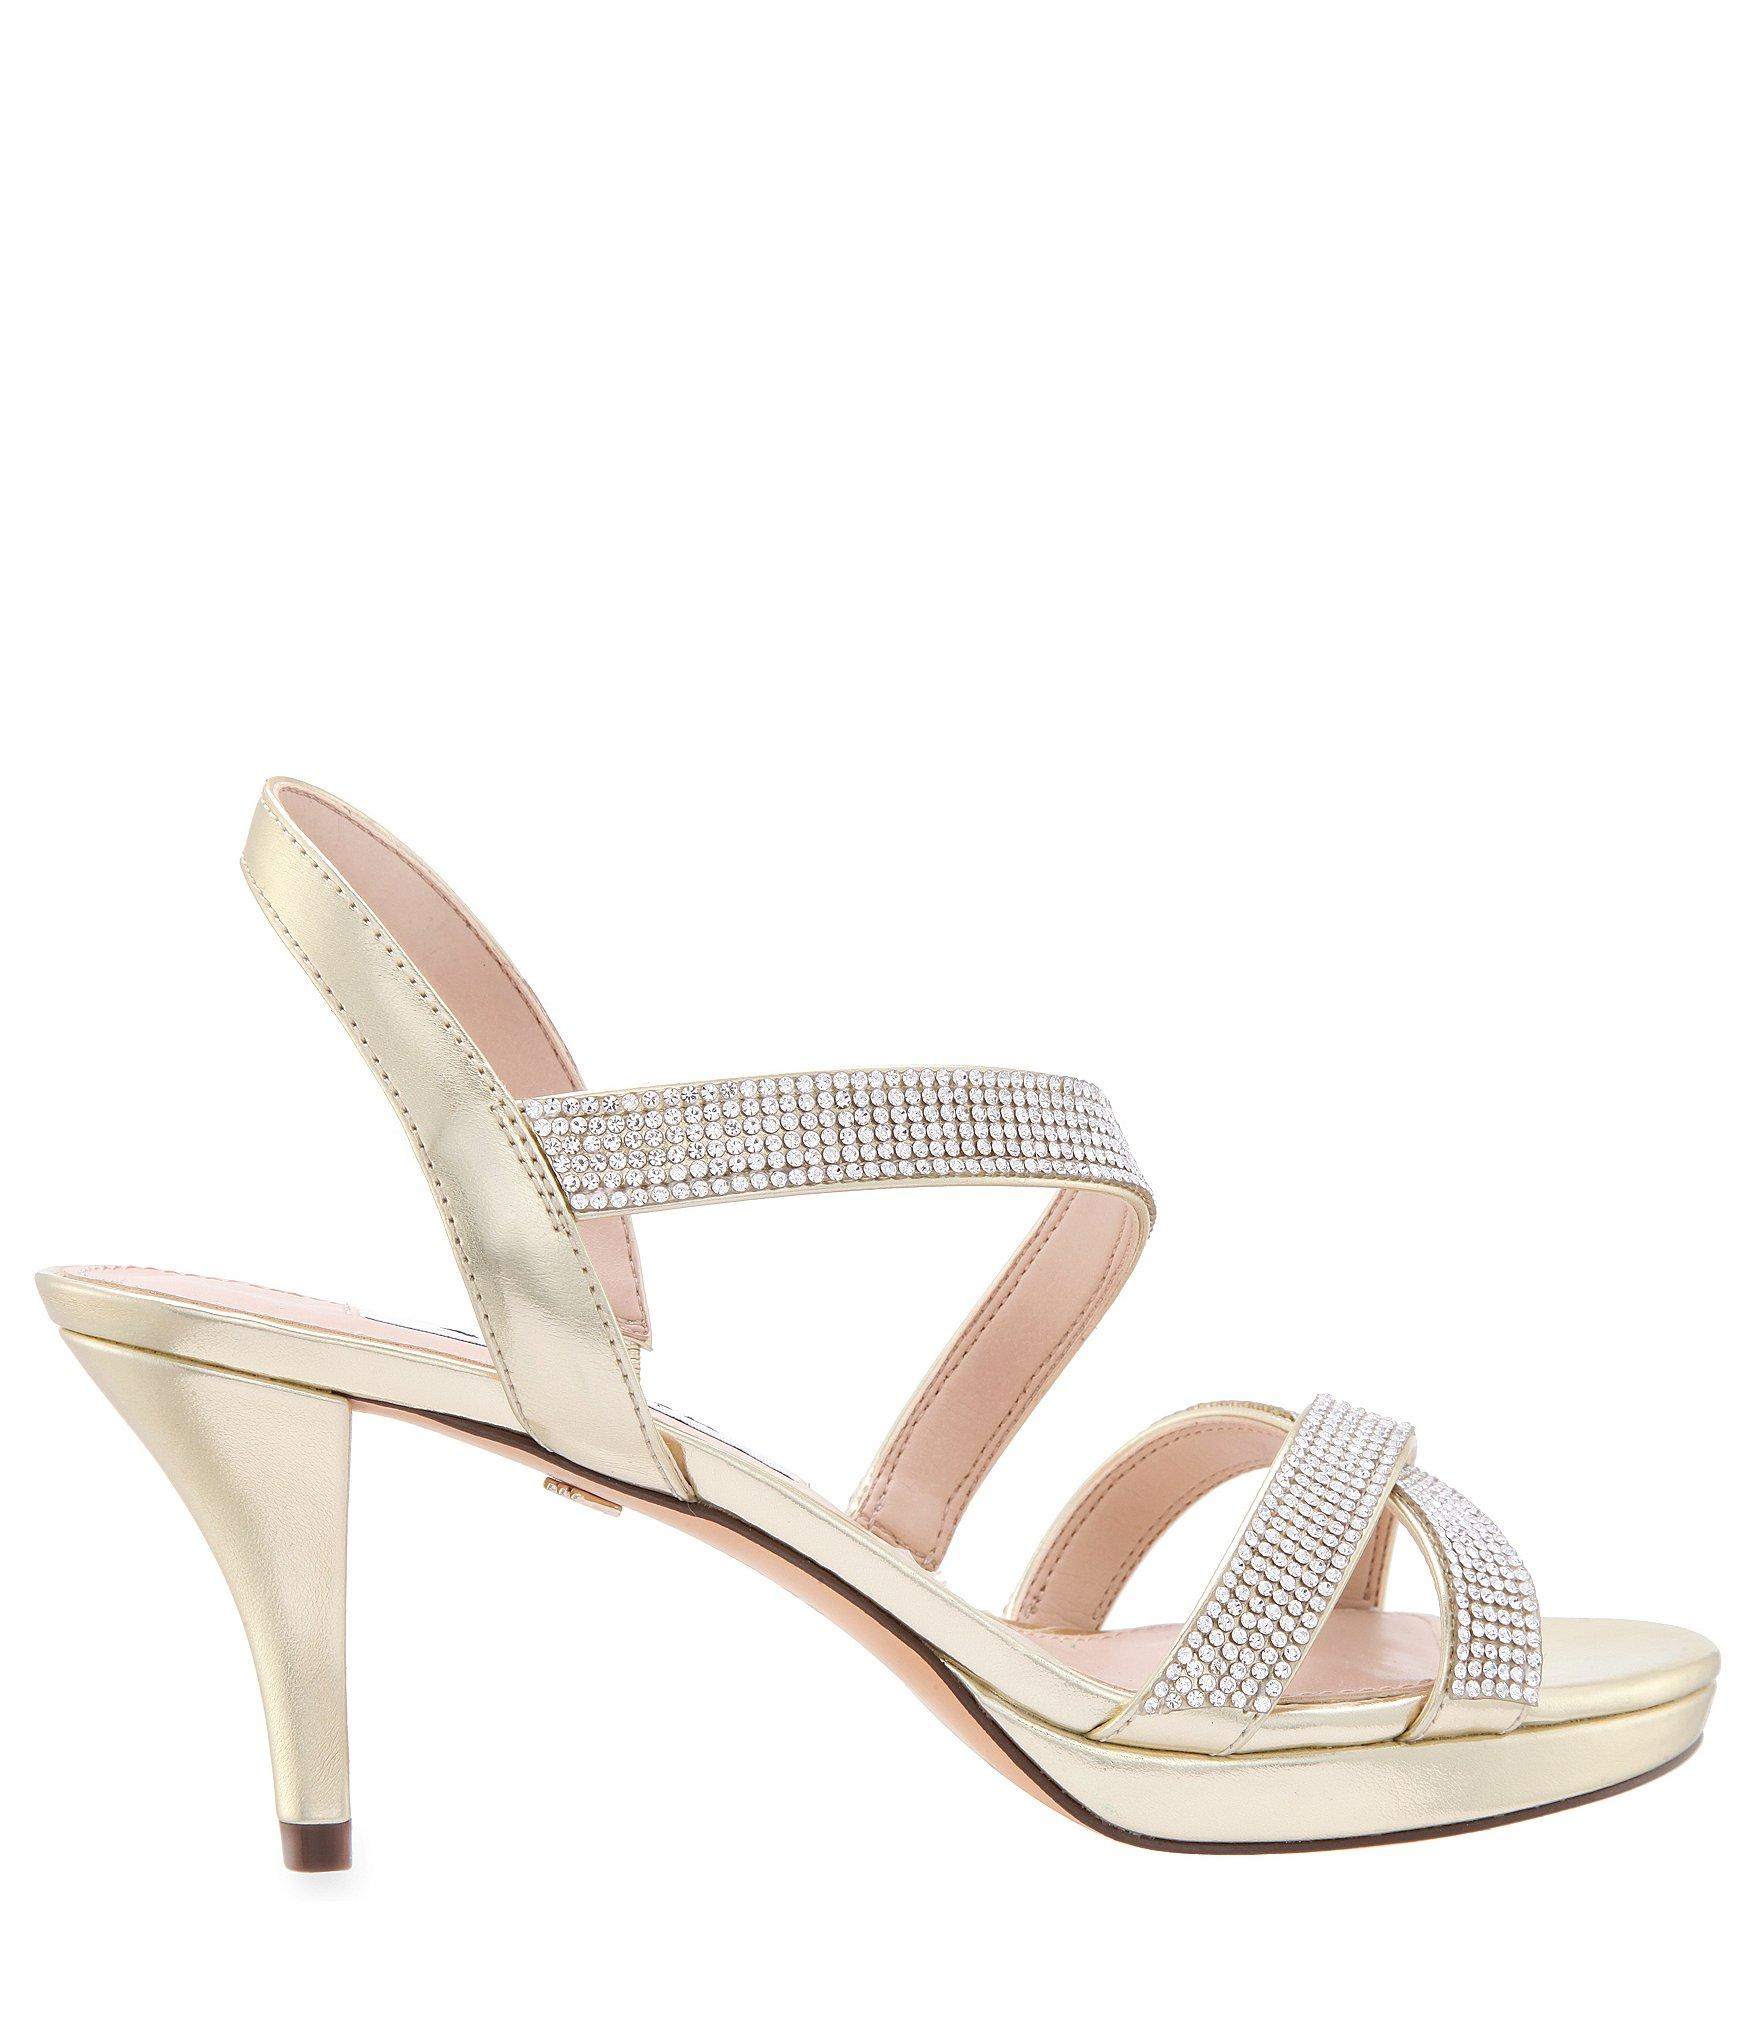 acdb7da05 Nina - Multicolor Nizana Jeweled Strappy Metallic Dress Sandals - Lyst.  View fullscreen